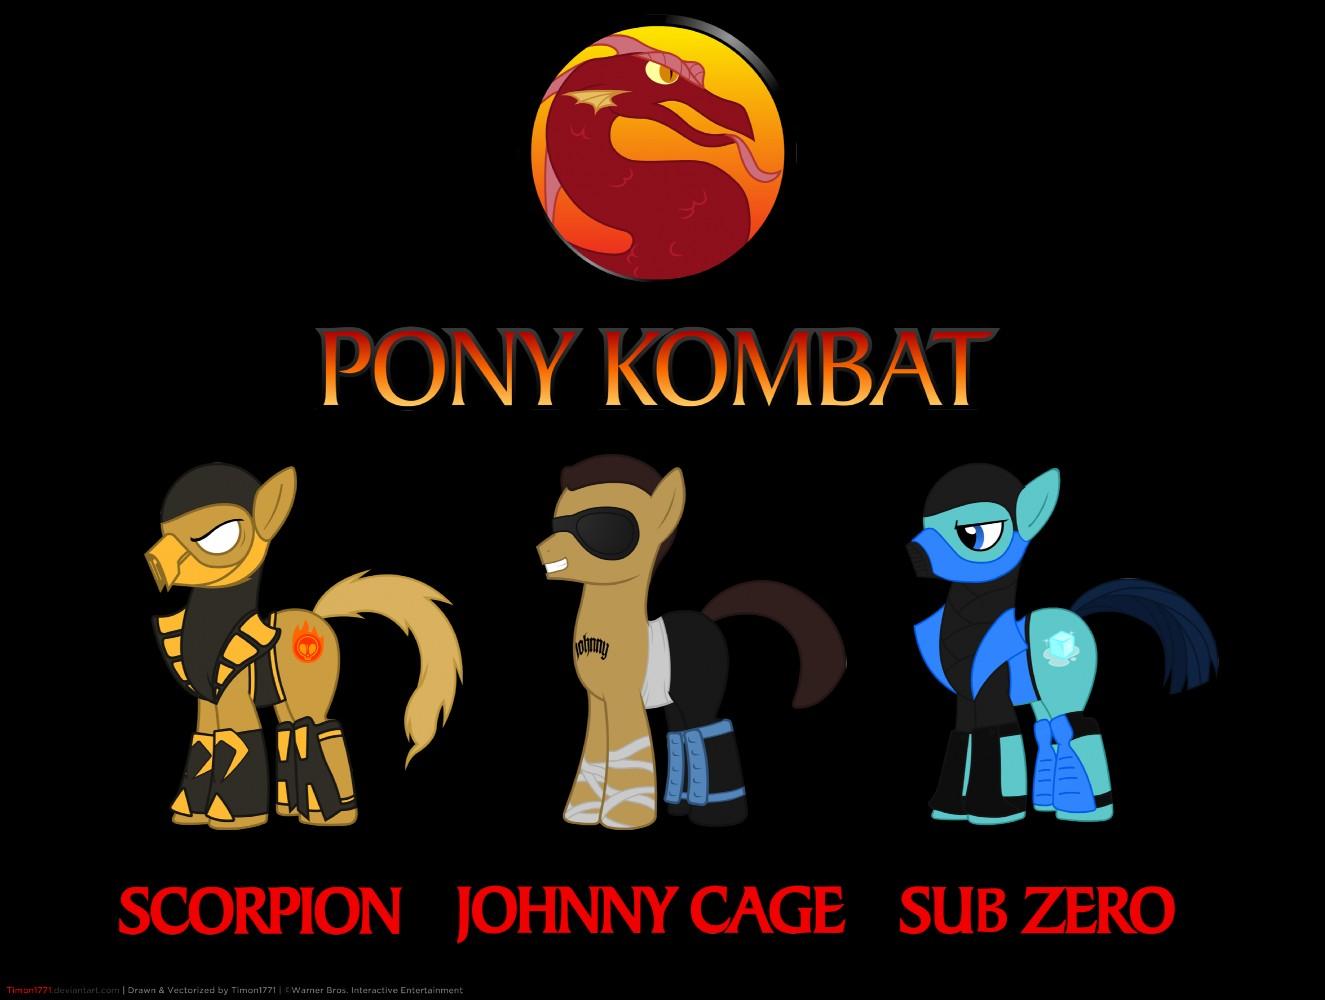 johnny cage, scorpion, and sub zero (mortal kombat) drawn ...